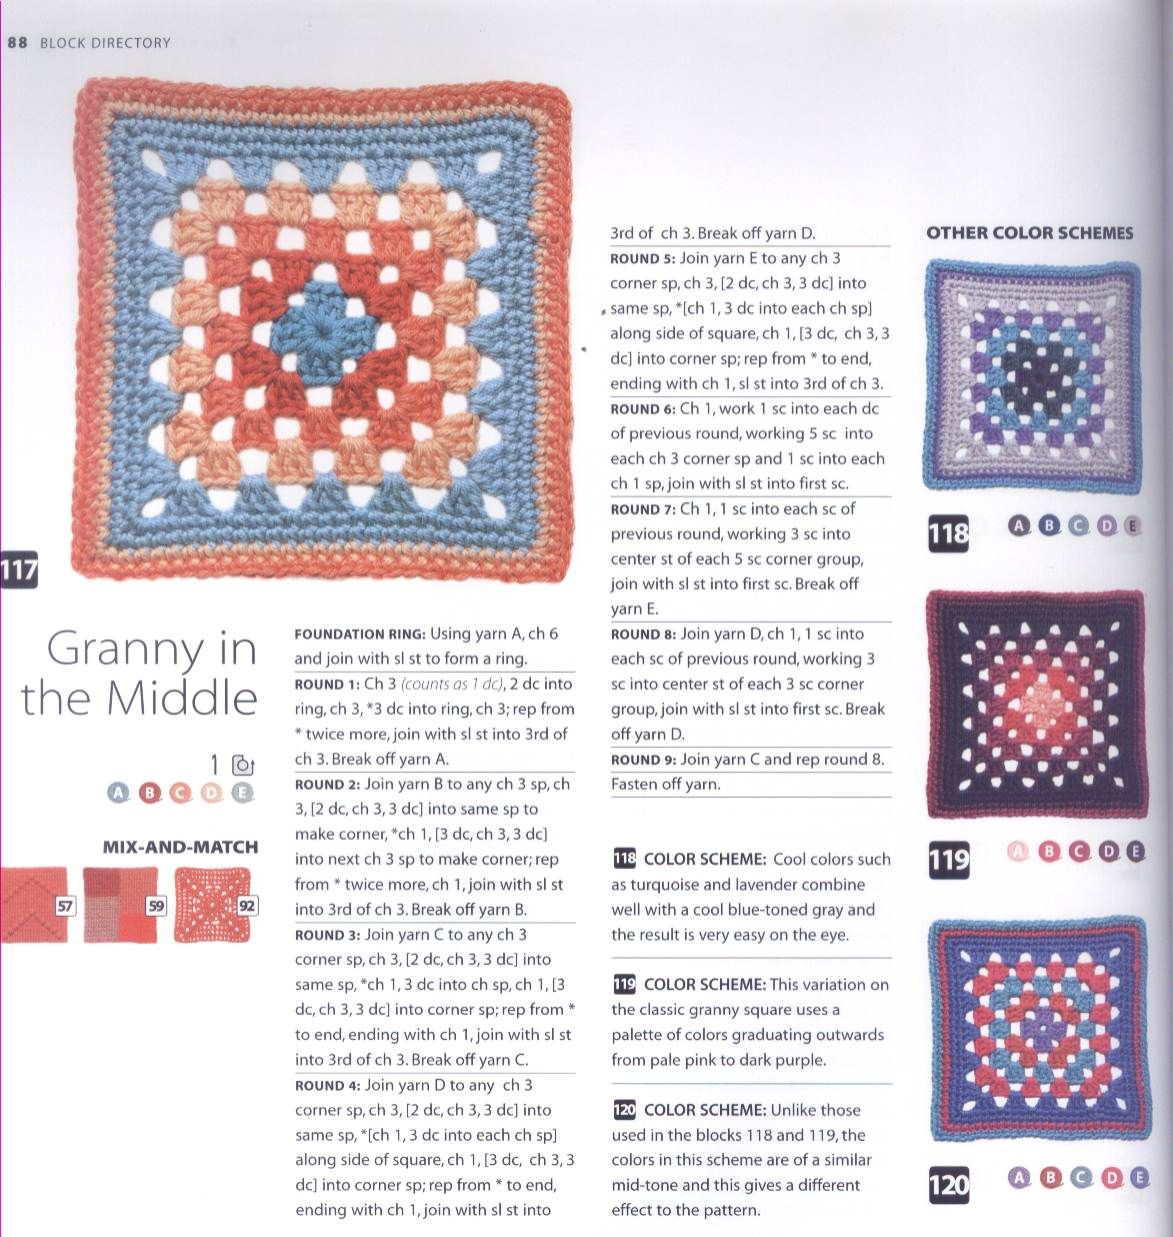 200 Crocheted Blocks for blankets, throws & Afghans 088